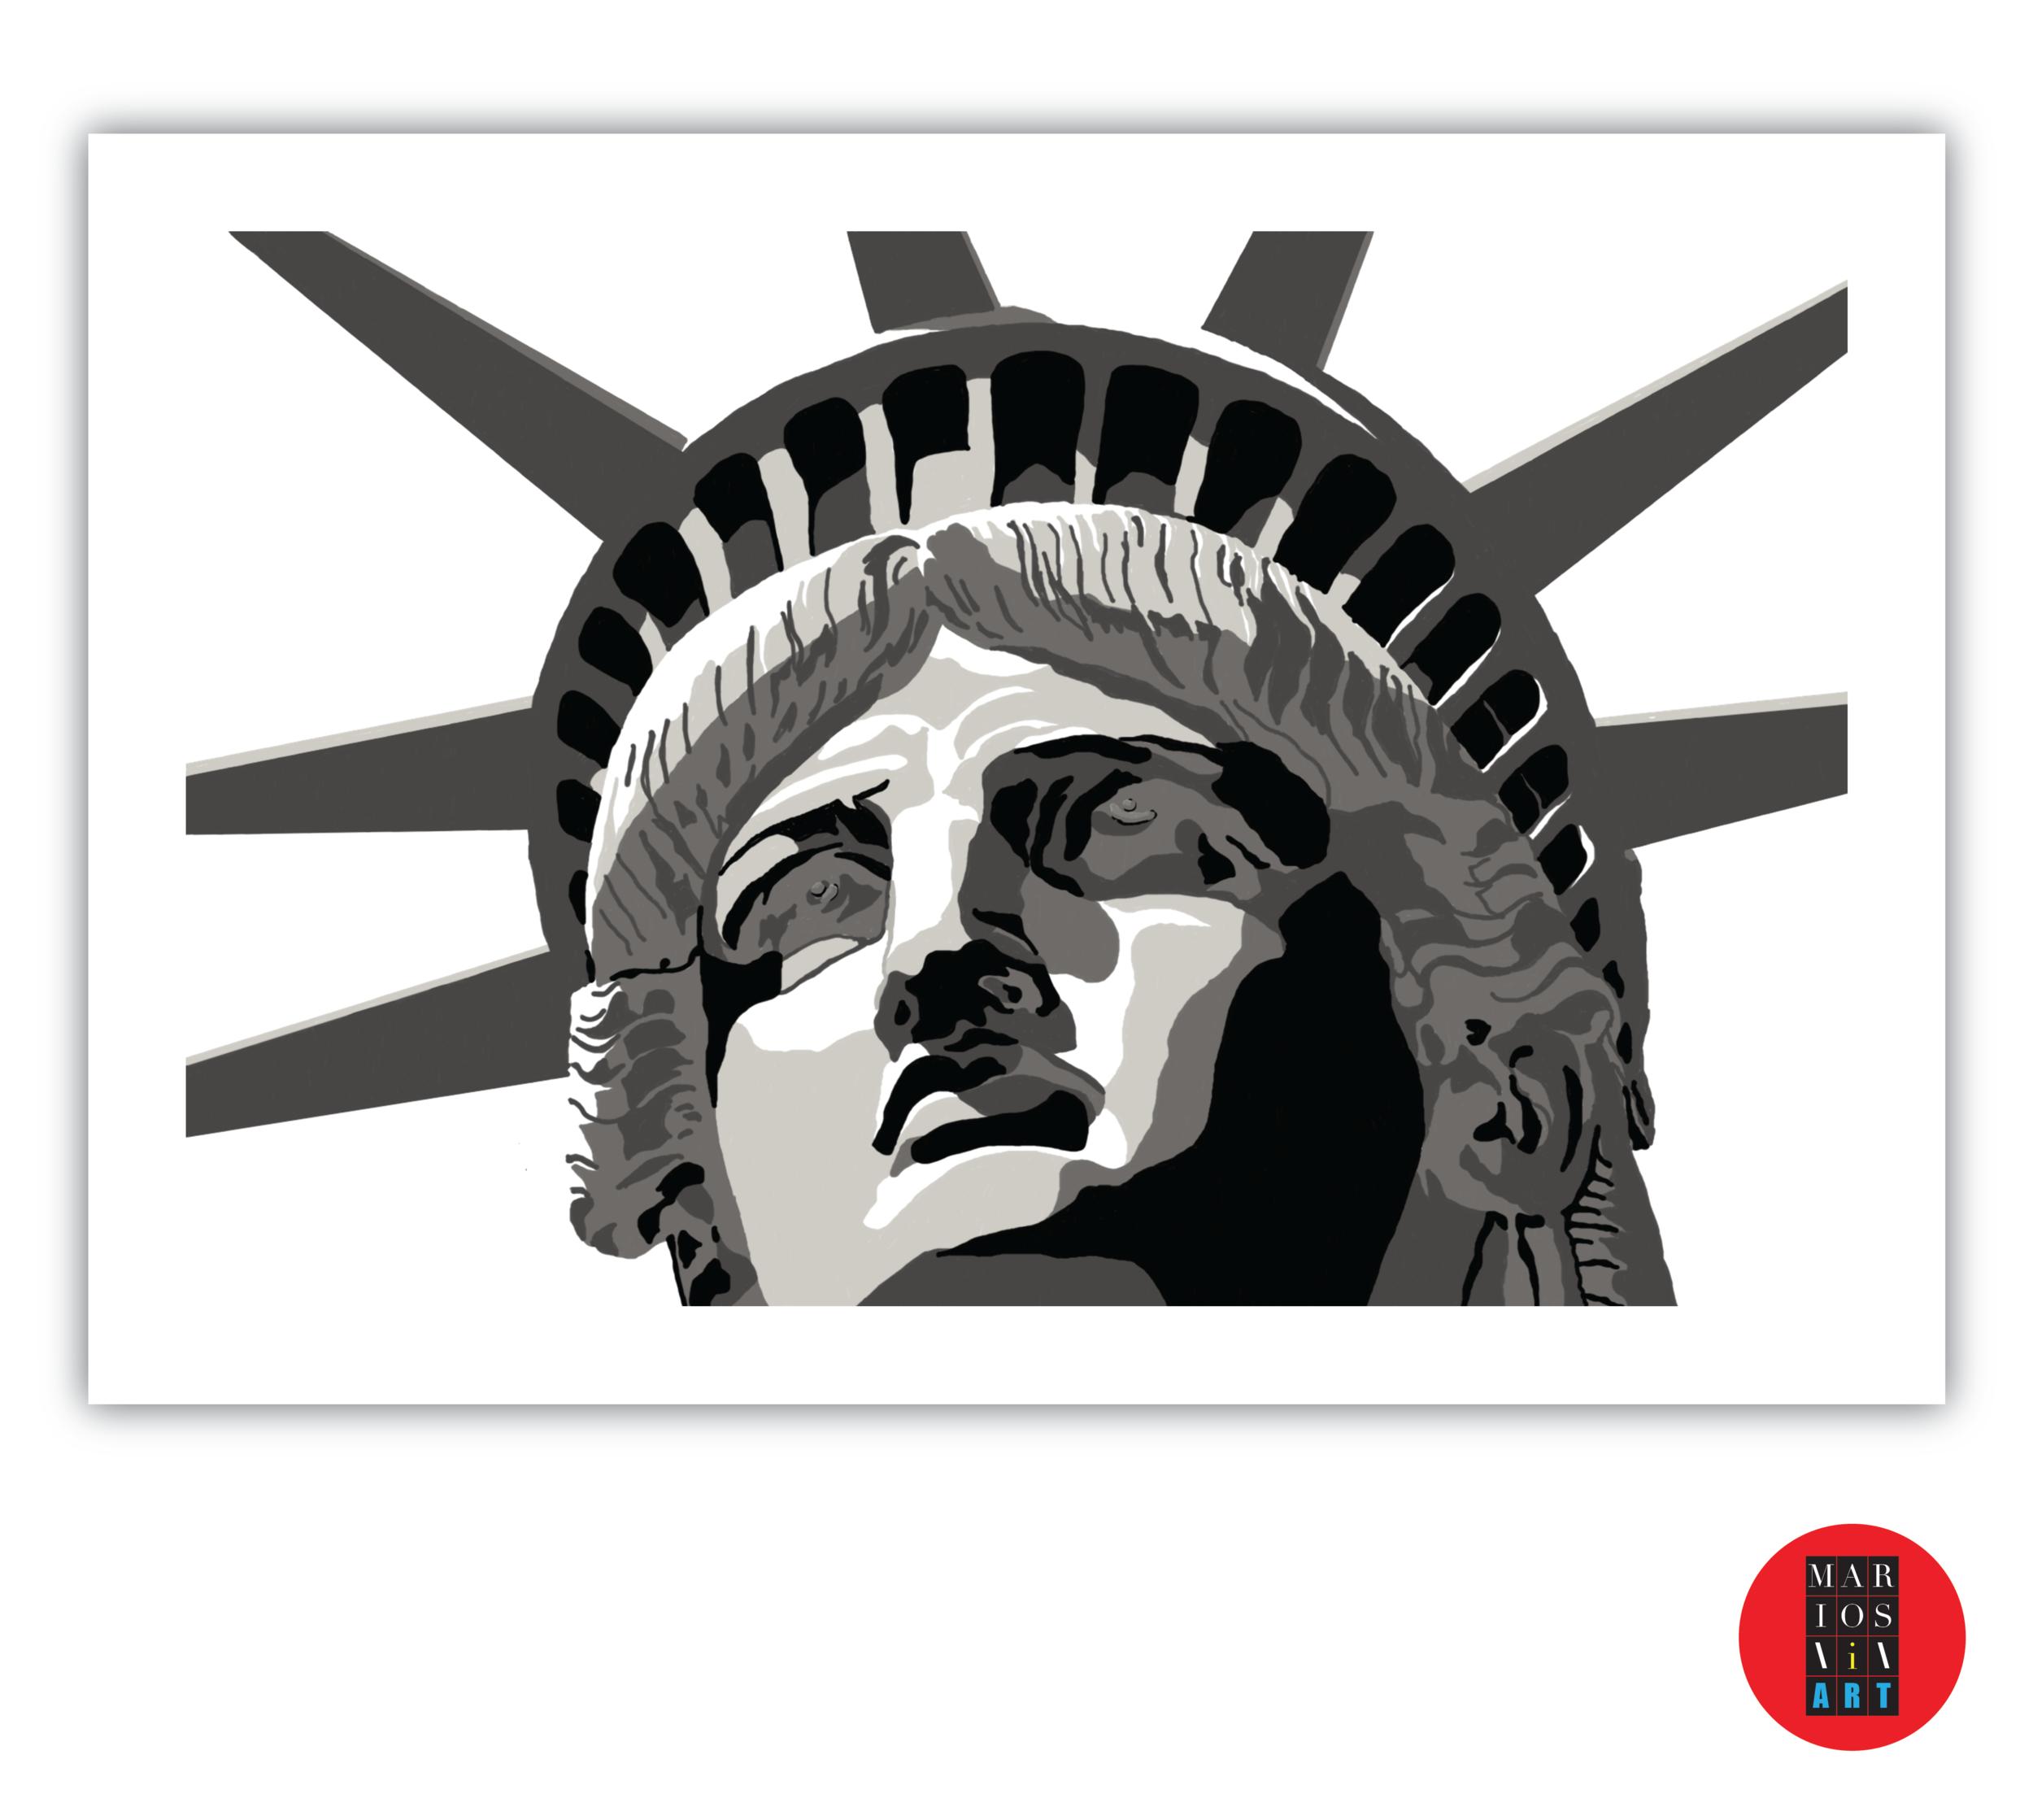 Artwork by Mario Saverino/MarioSiART  Title: Miss Liberty